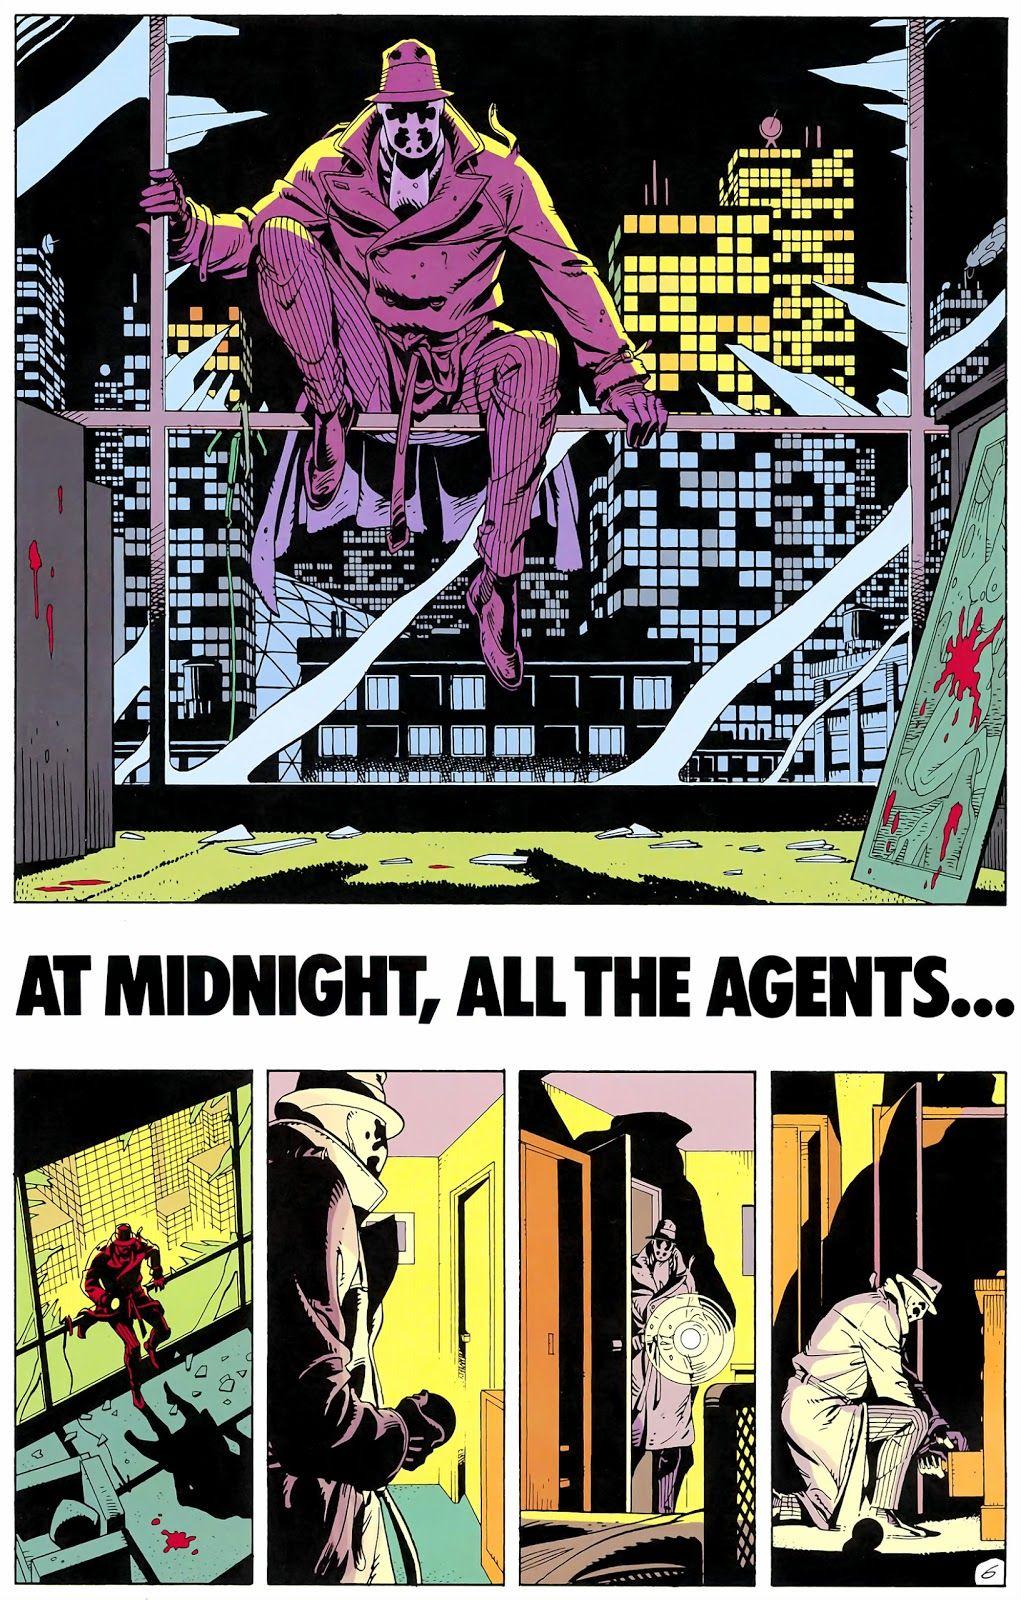 watchmen issue 1 read watchmen issue 1 comic online in high